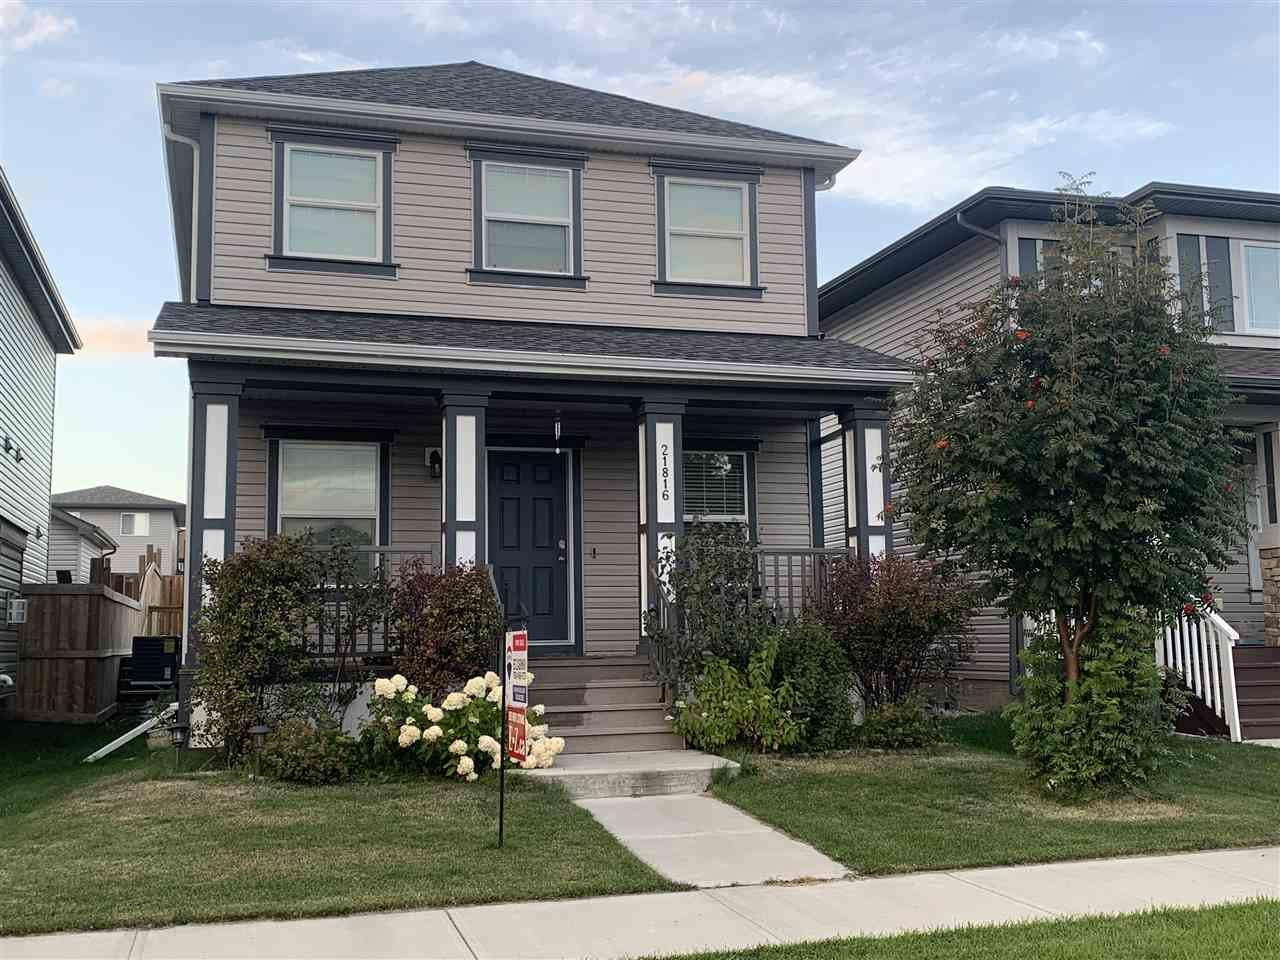 Main Photo: 21816 99 Avenue in Edmonton: Zone 58 House for sale : MLS®# E4210598